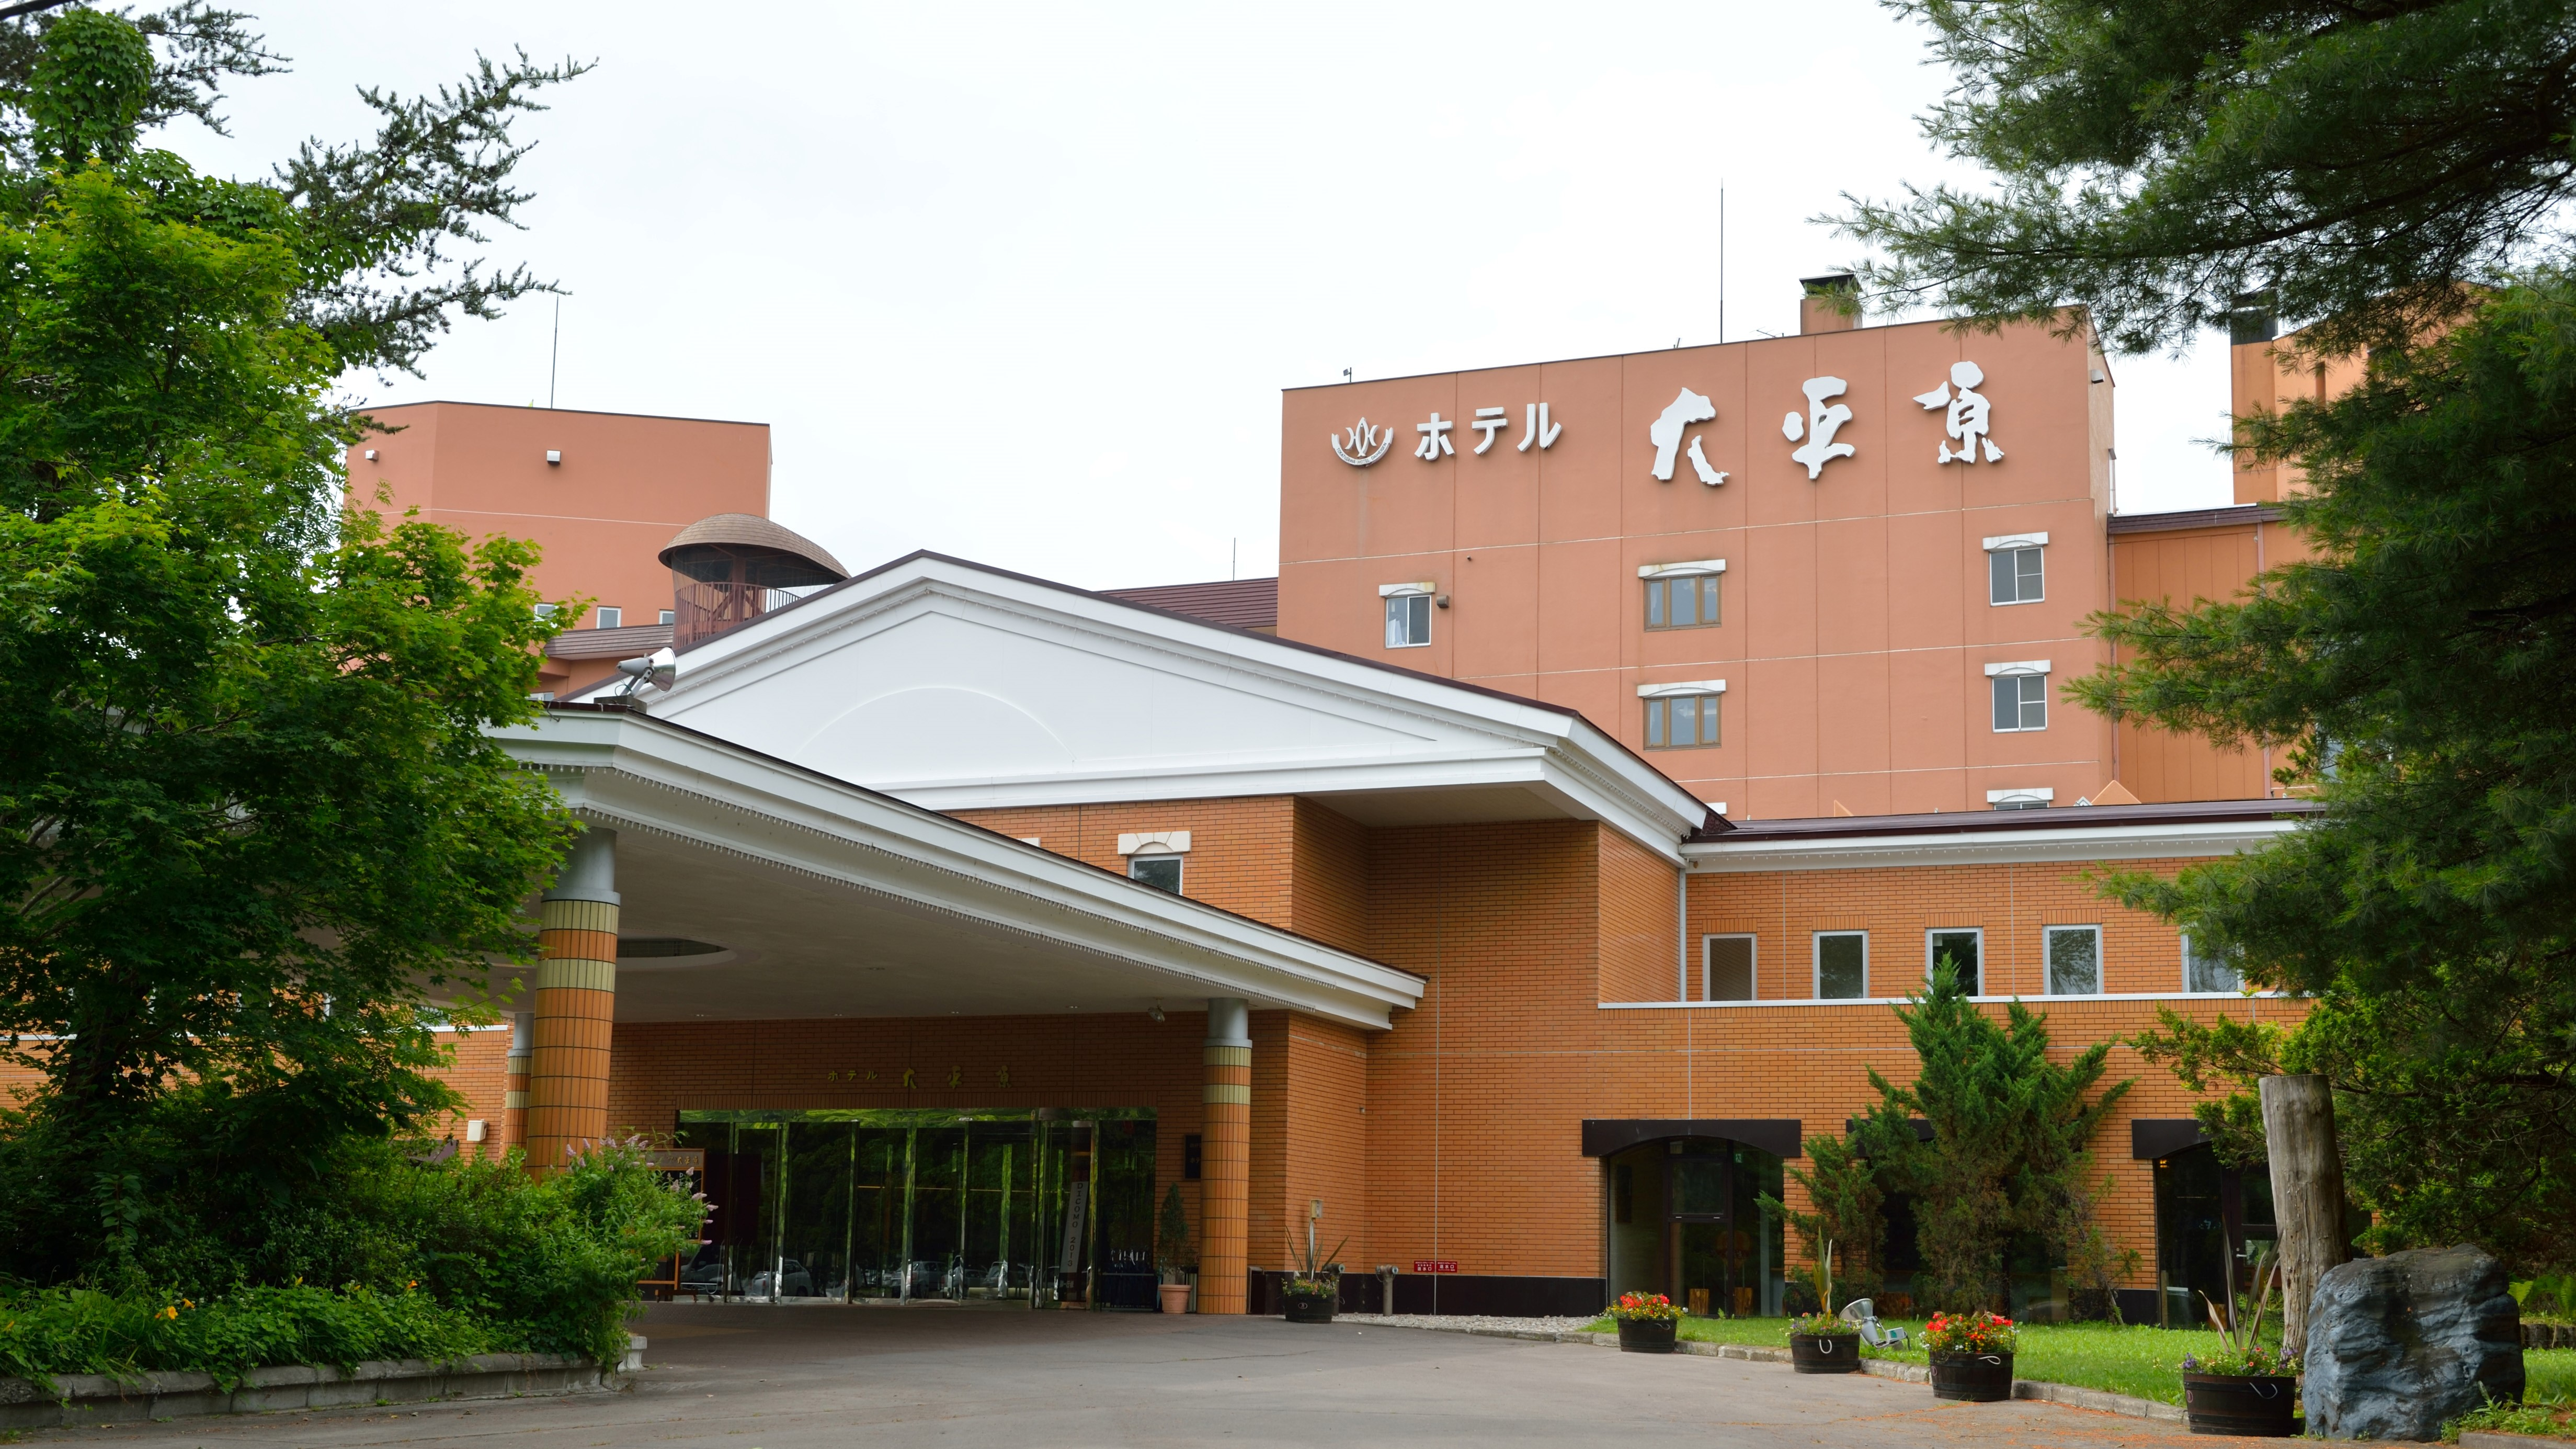 十勝川温泉 ホテル大平原